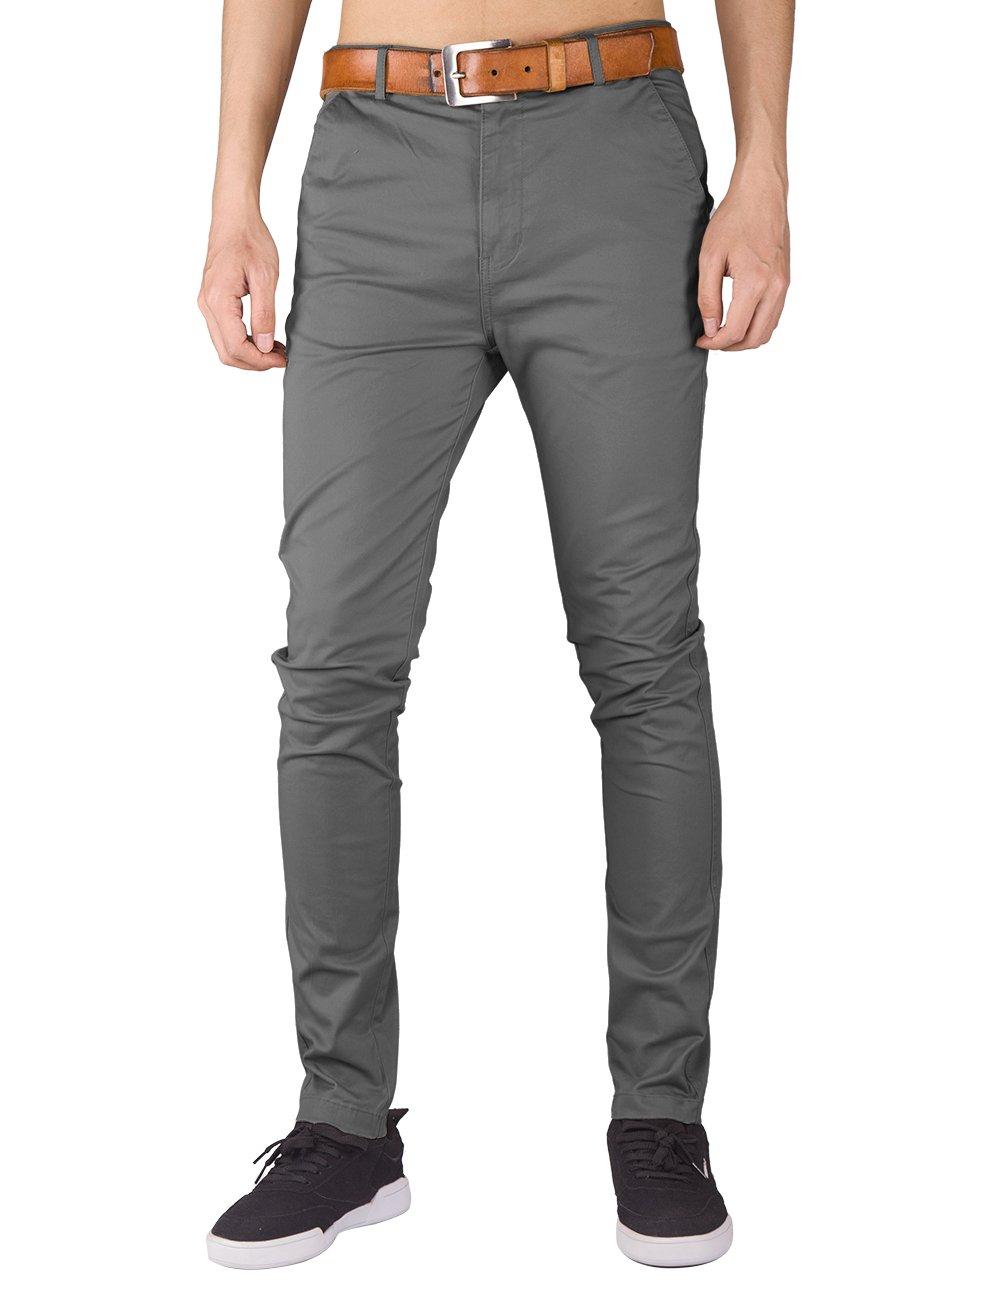 ITALY MORN Mens Flat Front Chino Pants Casual Khakis Slim Fit (M, Mid Grey)